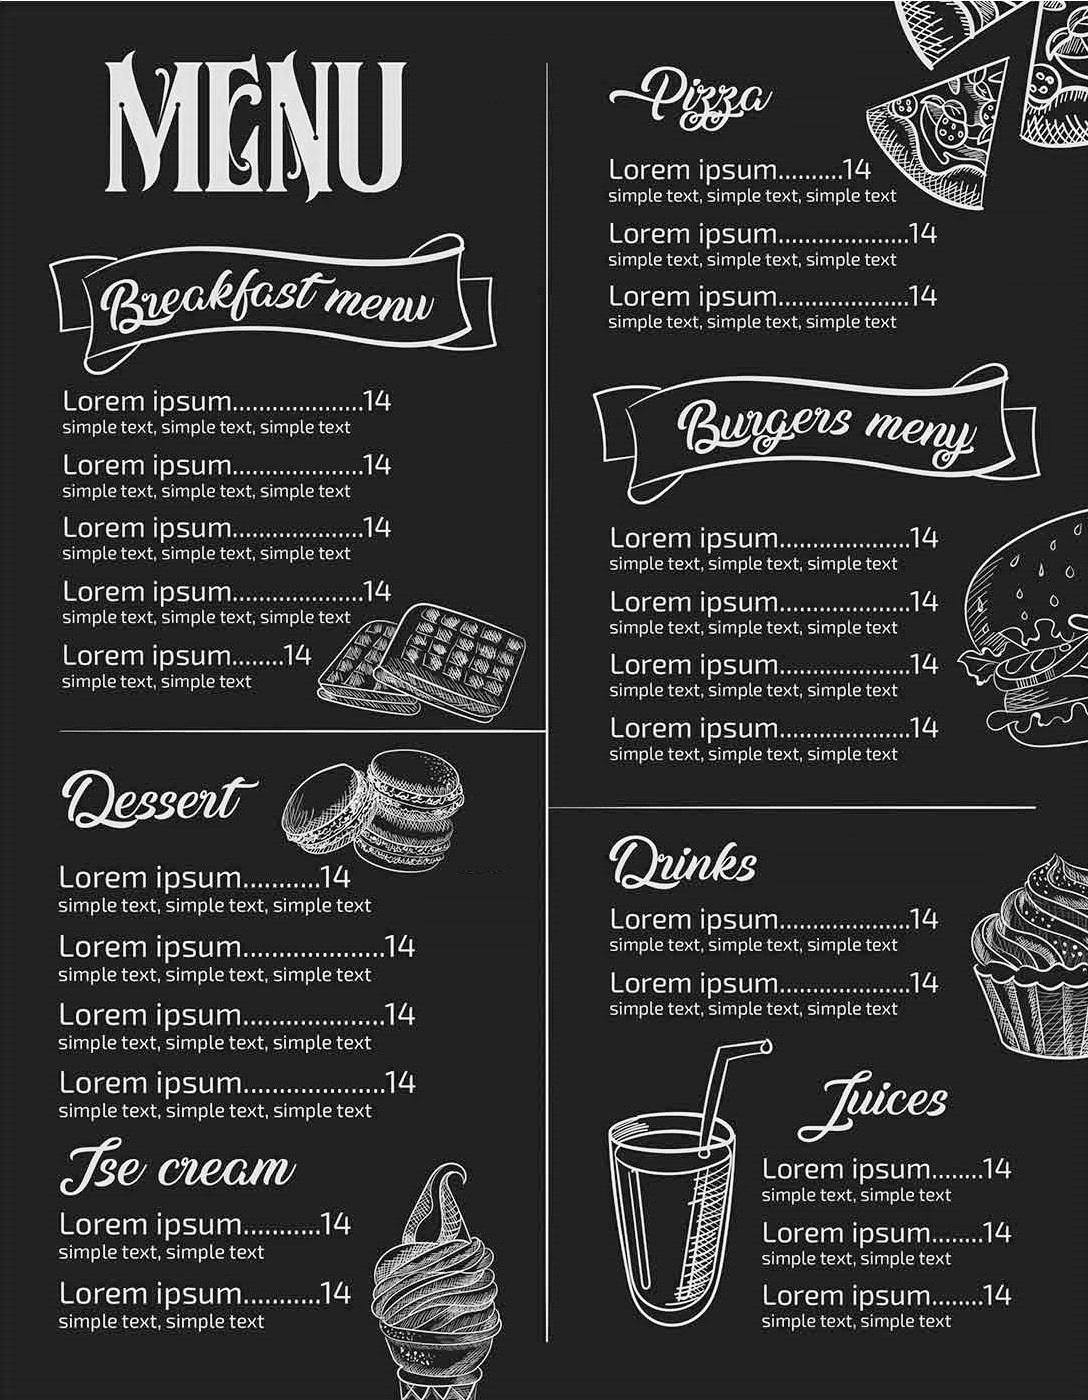 Menu Template Free Download Restaurant  Psd Word HtmlFull